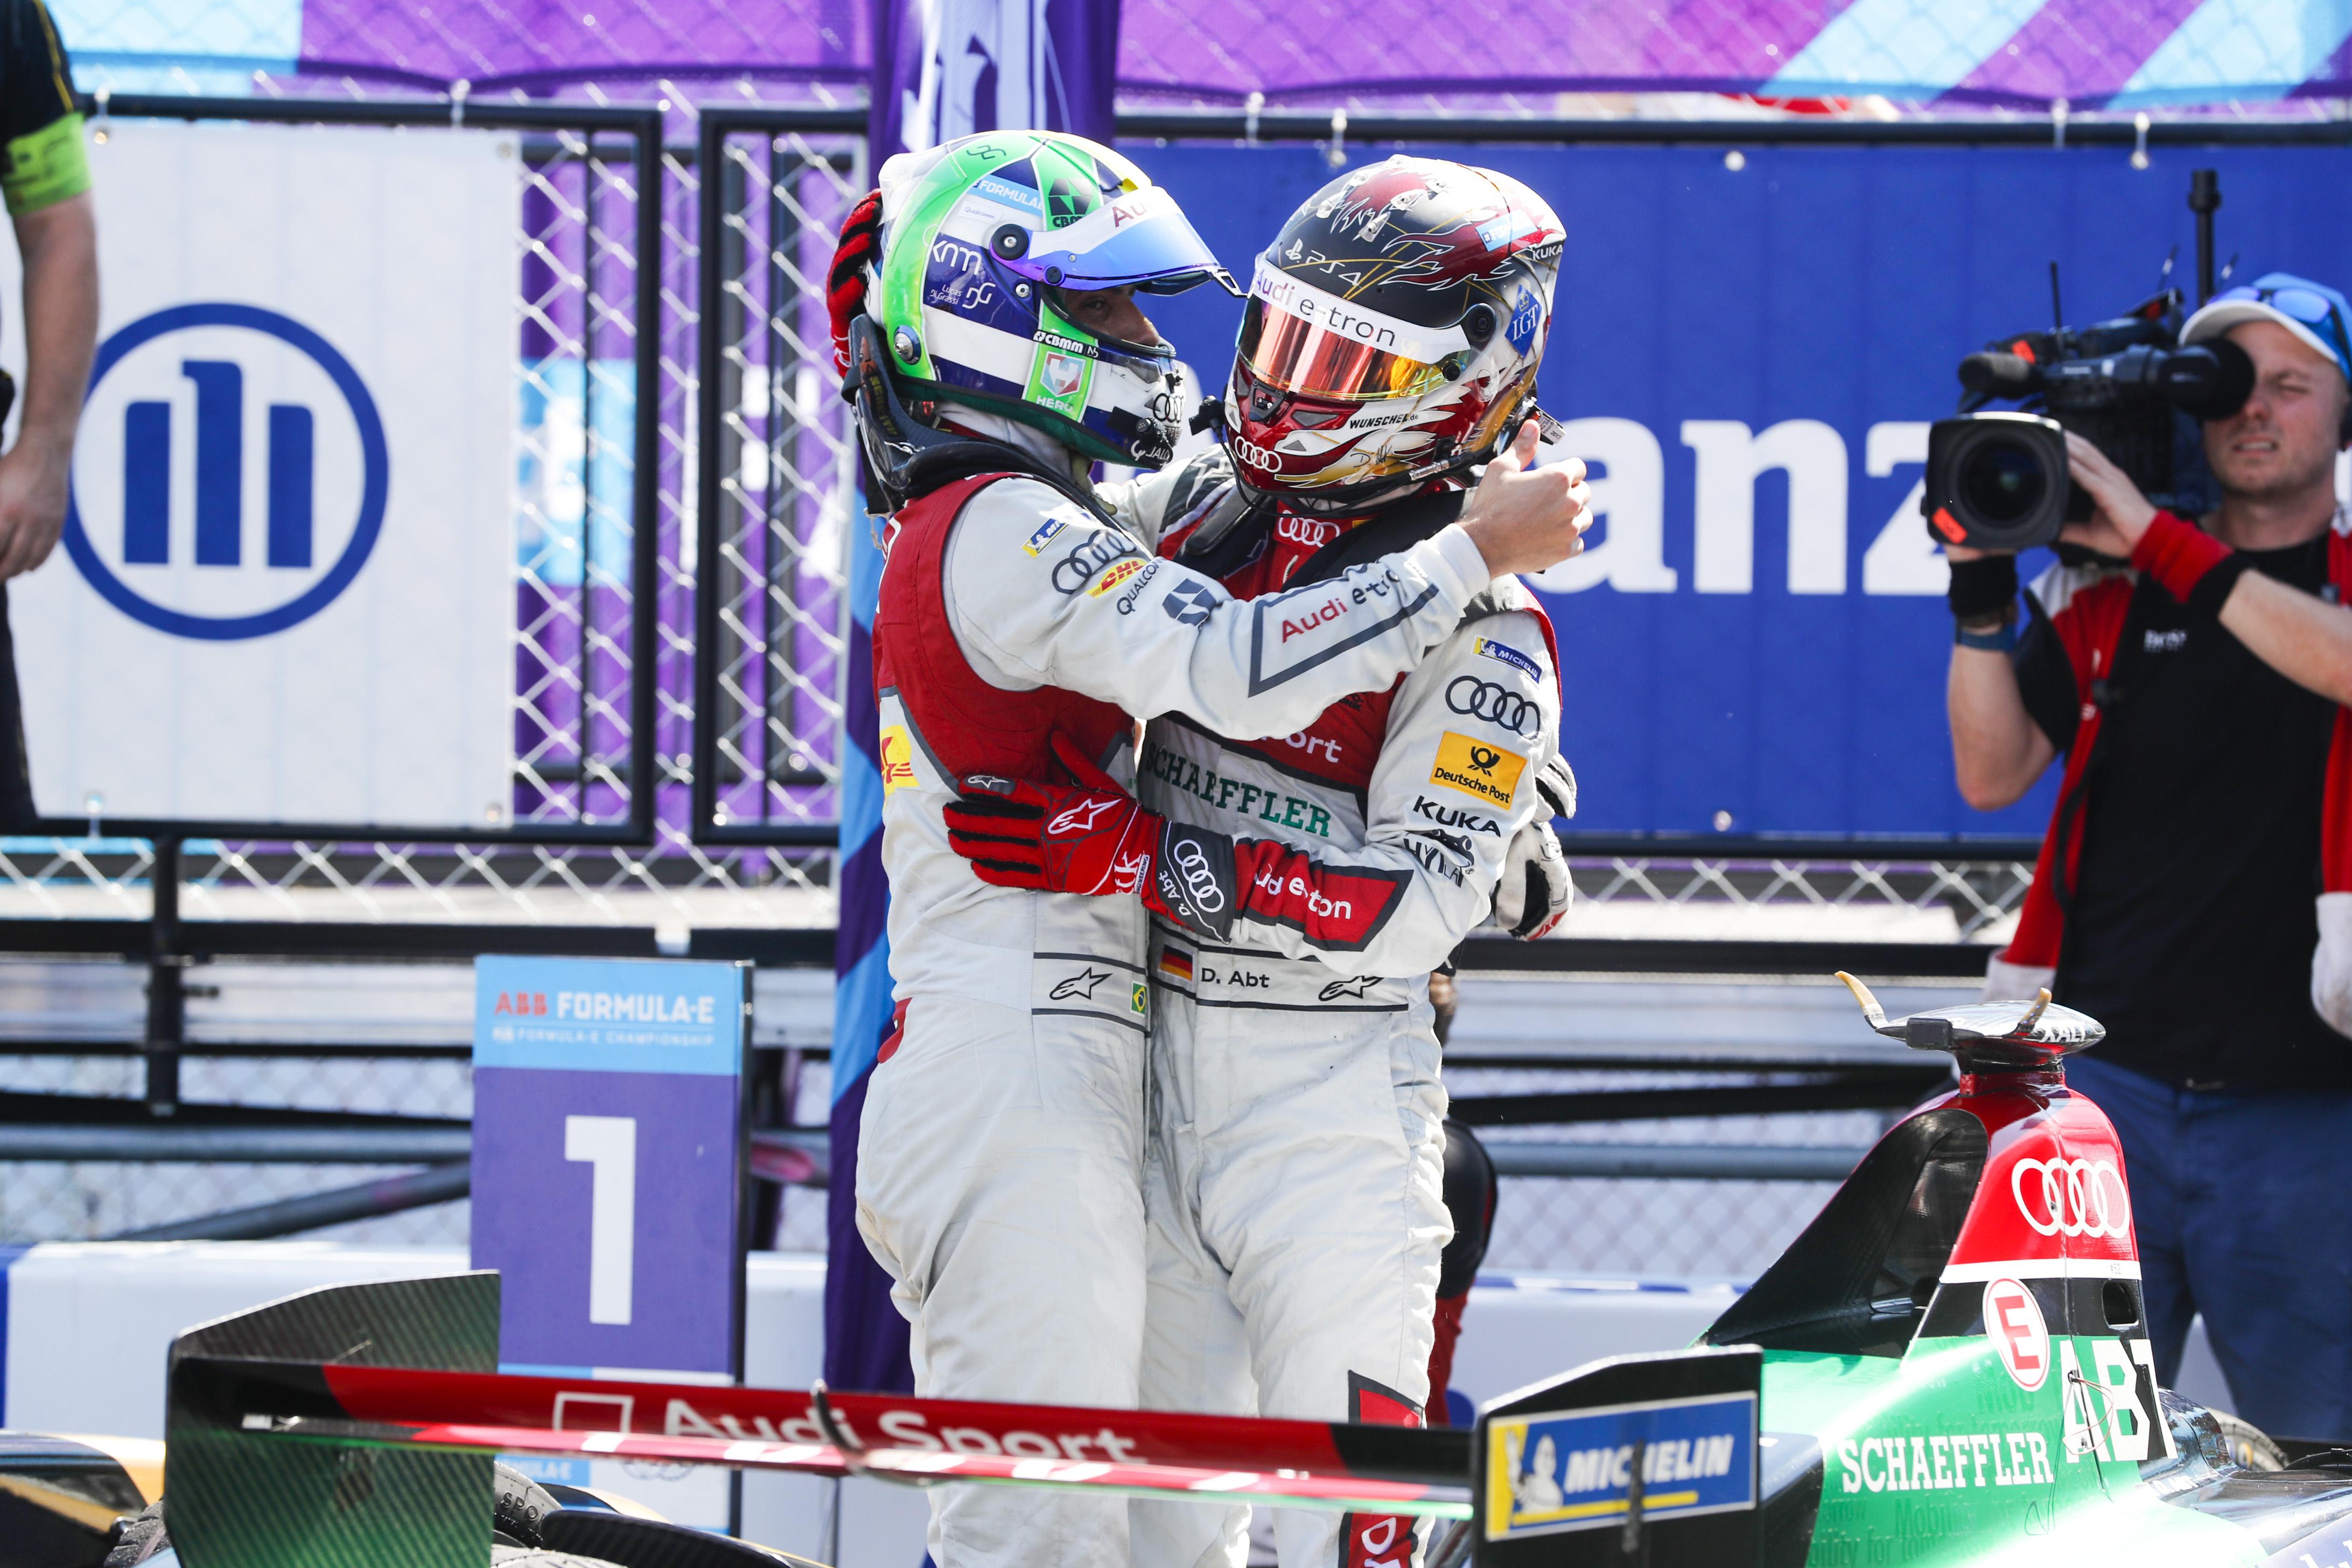 (L-R)_Lucas_di_Grassi_and_Daniel_Abt_embracing_each_other_in_parc_ferme_after_Audi_Sport_ABT_Schaeffler_collect_the_sought_after_teams__title